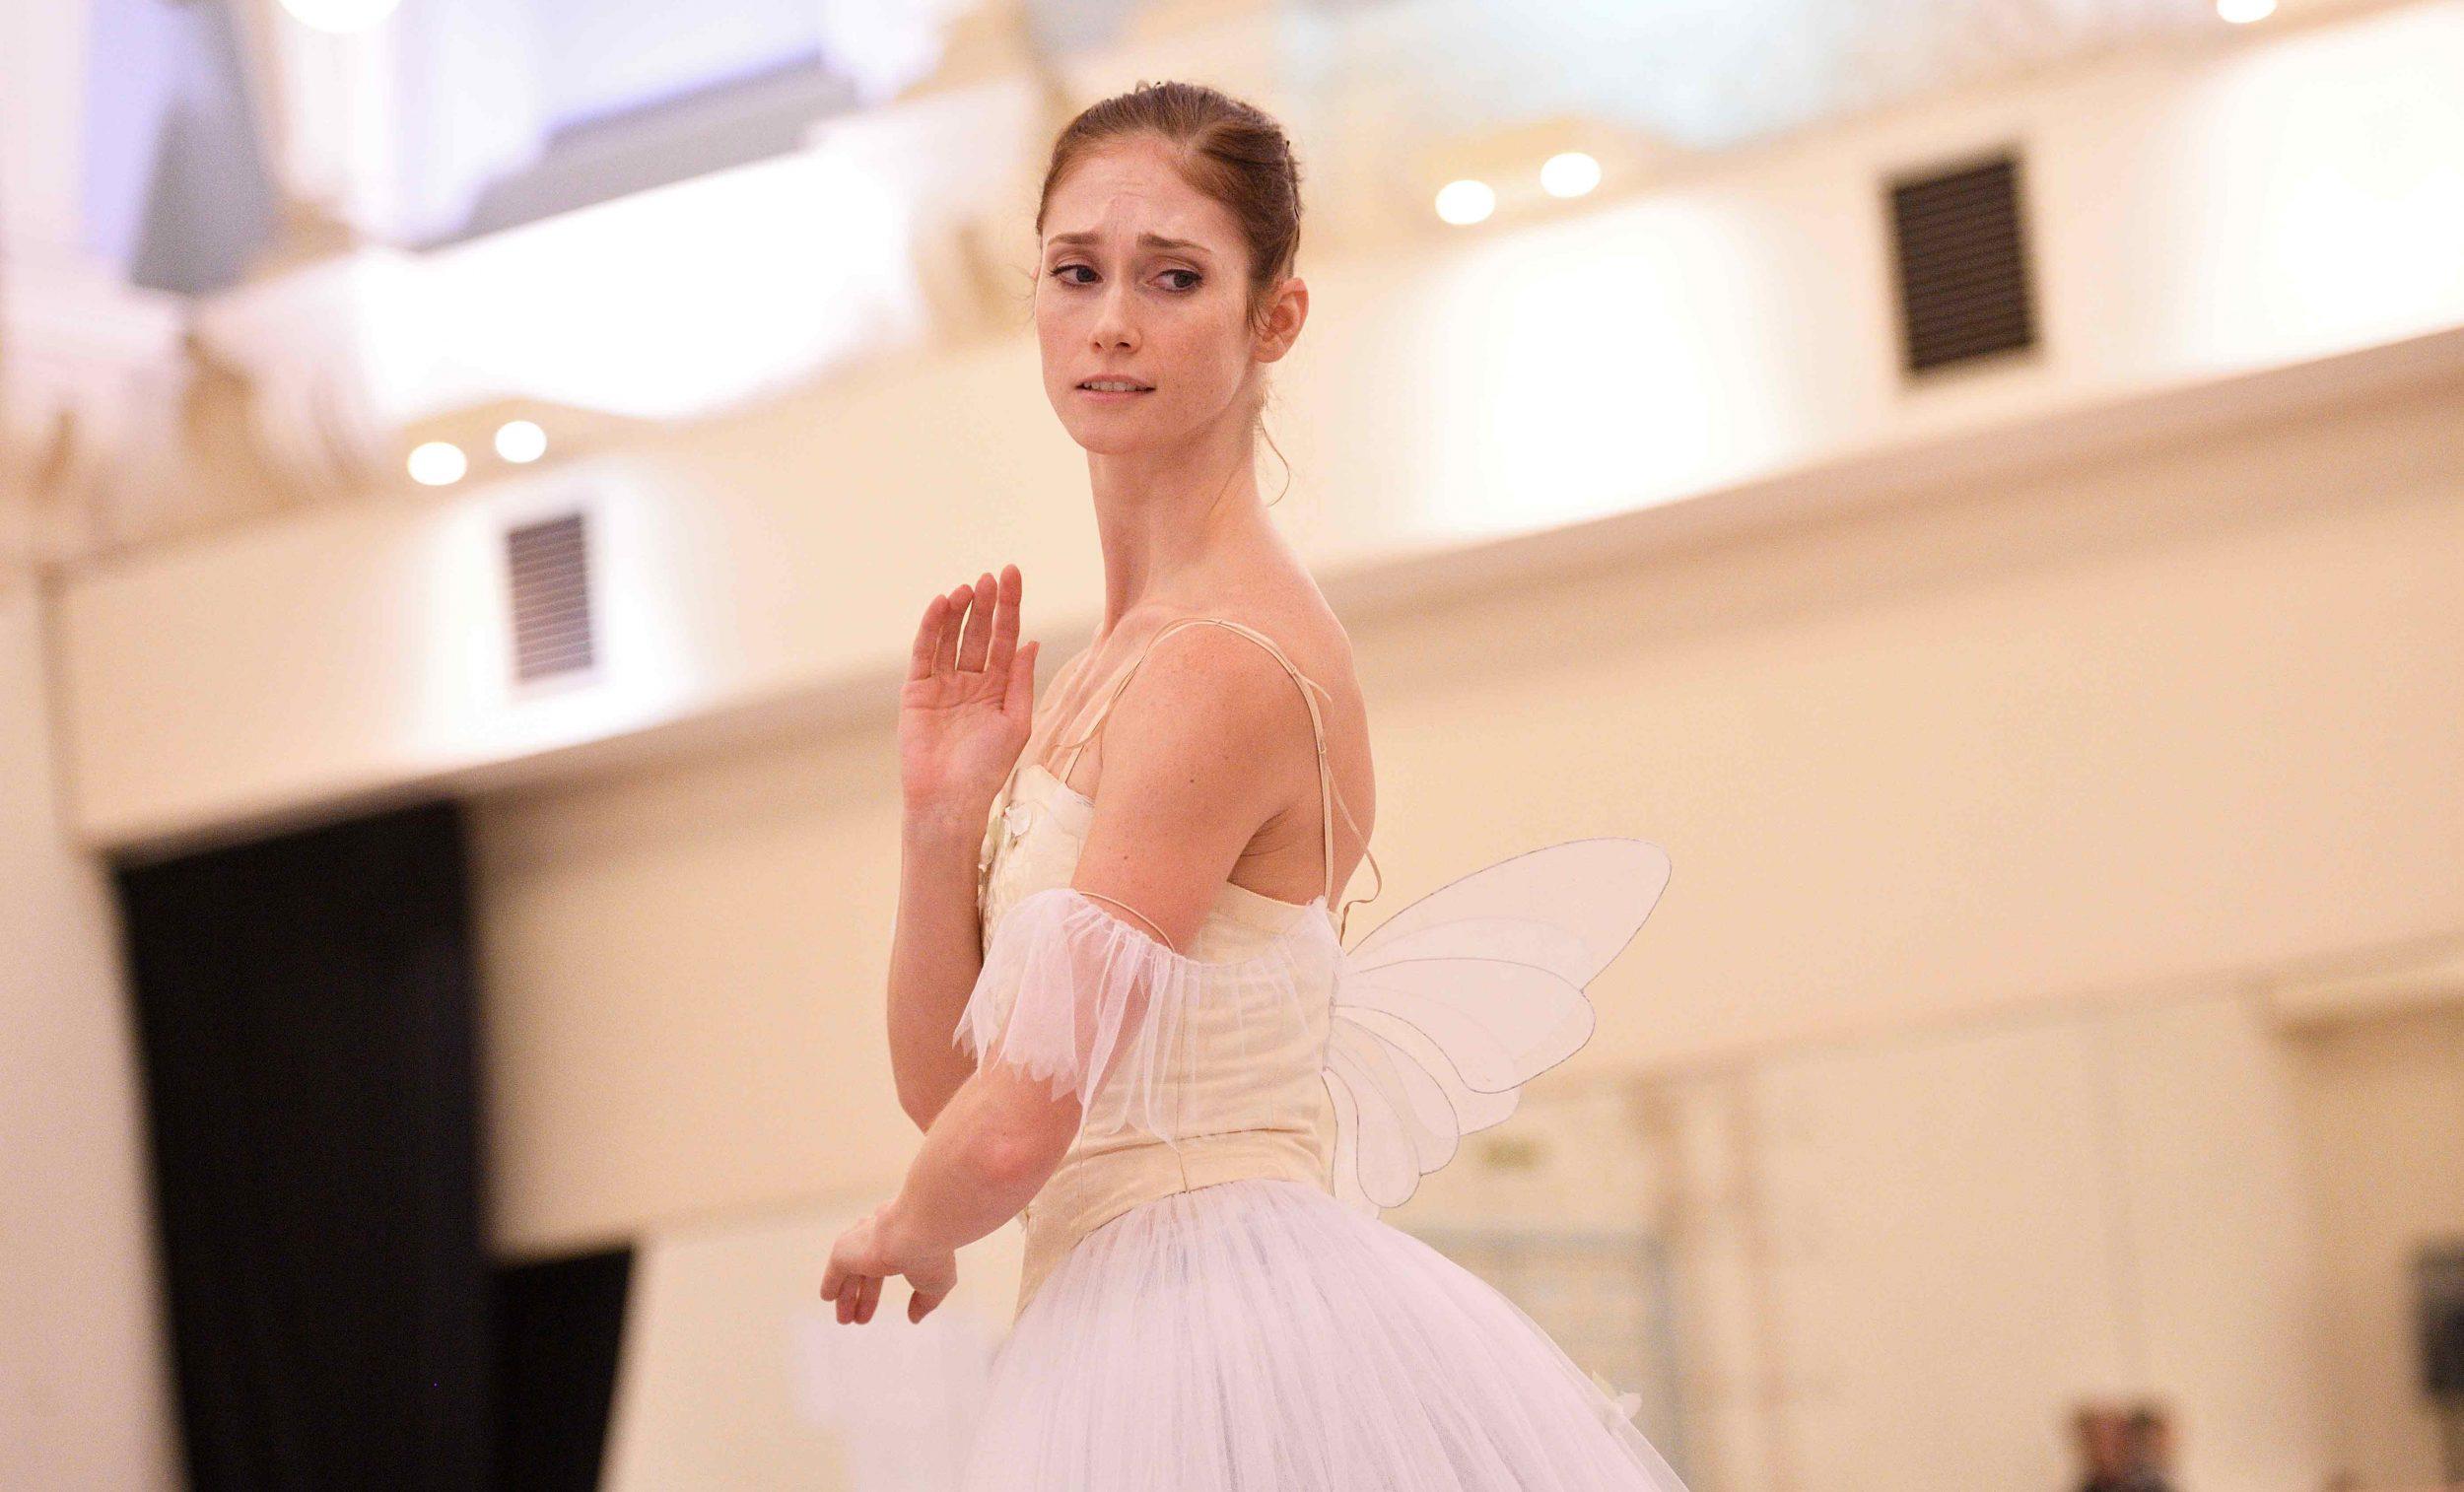 Alison-McWhinney-rehearsing-La-Sylphide-©-Laurent-Liotardo-(1)